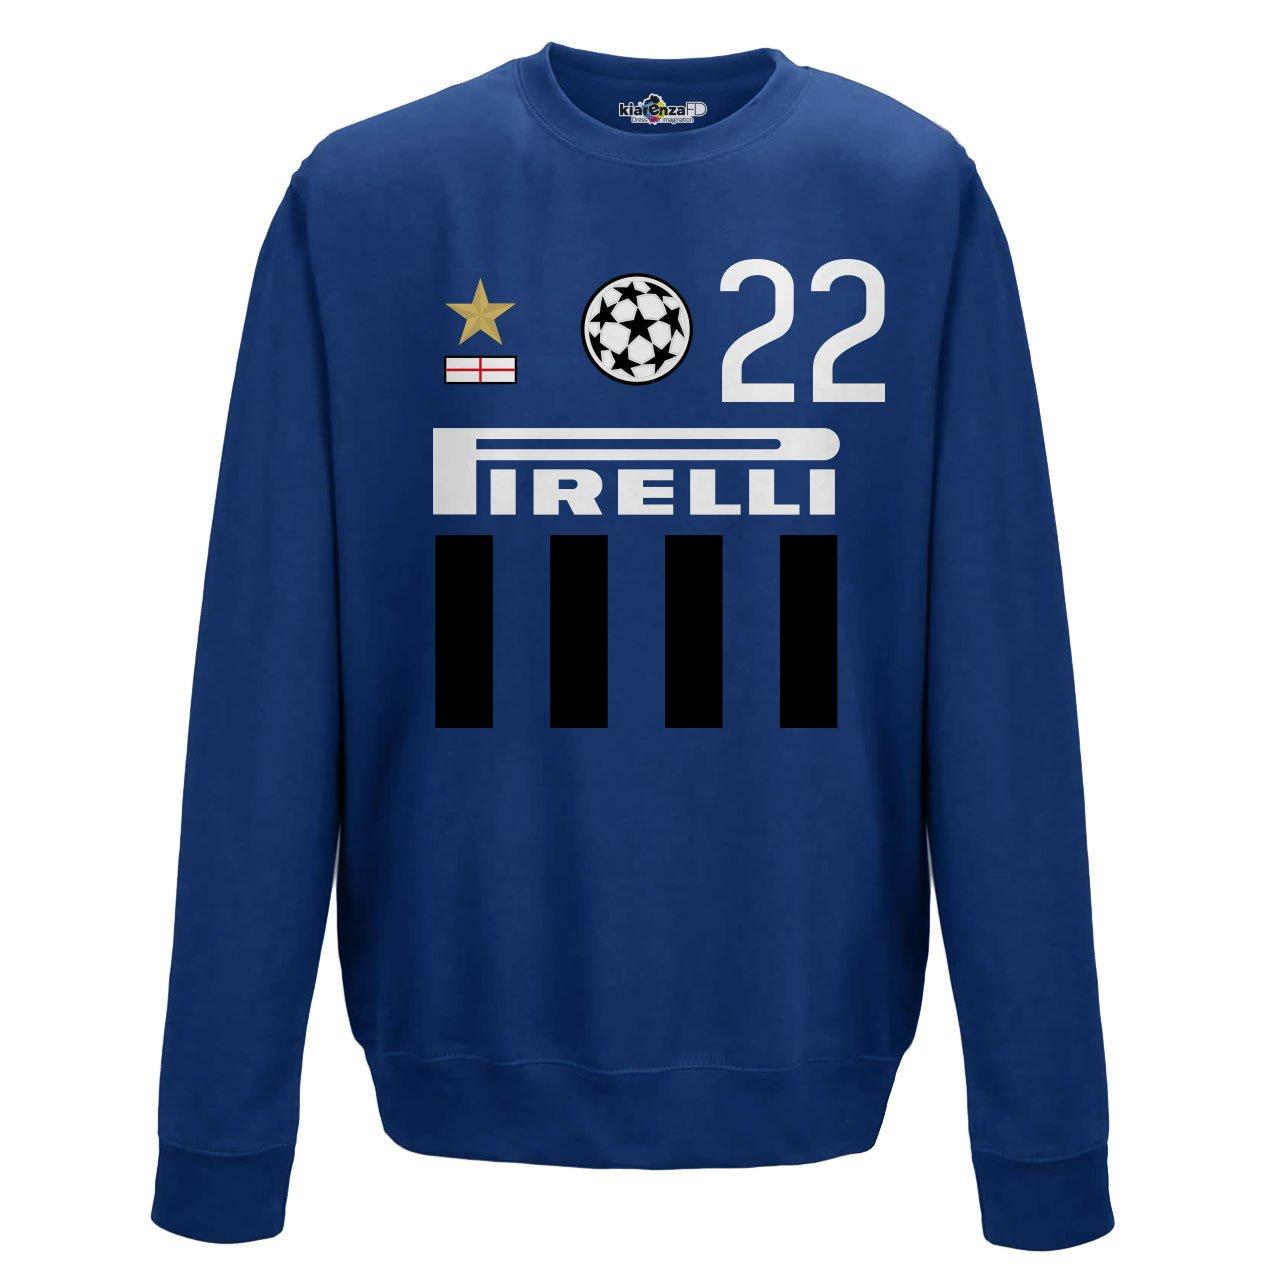 KiarenzaFD Felpa Girocollo Calcio Vintage Diego Inter 22 Milito Stagione 09-10 Champion KFG01954